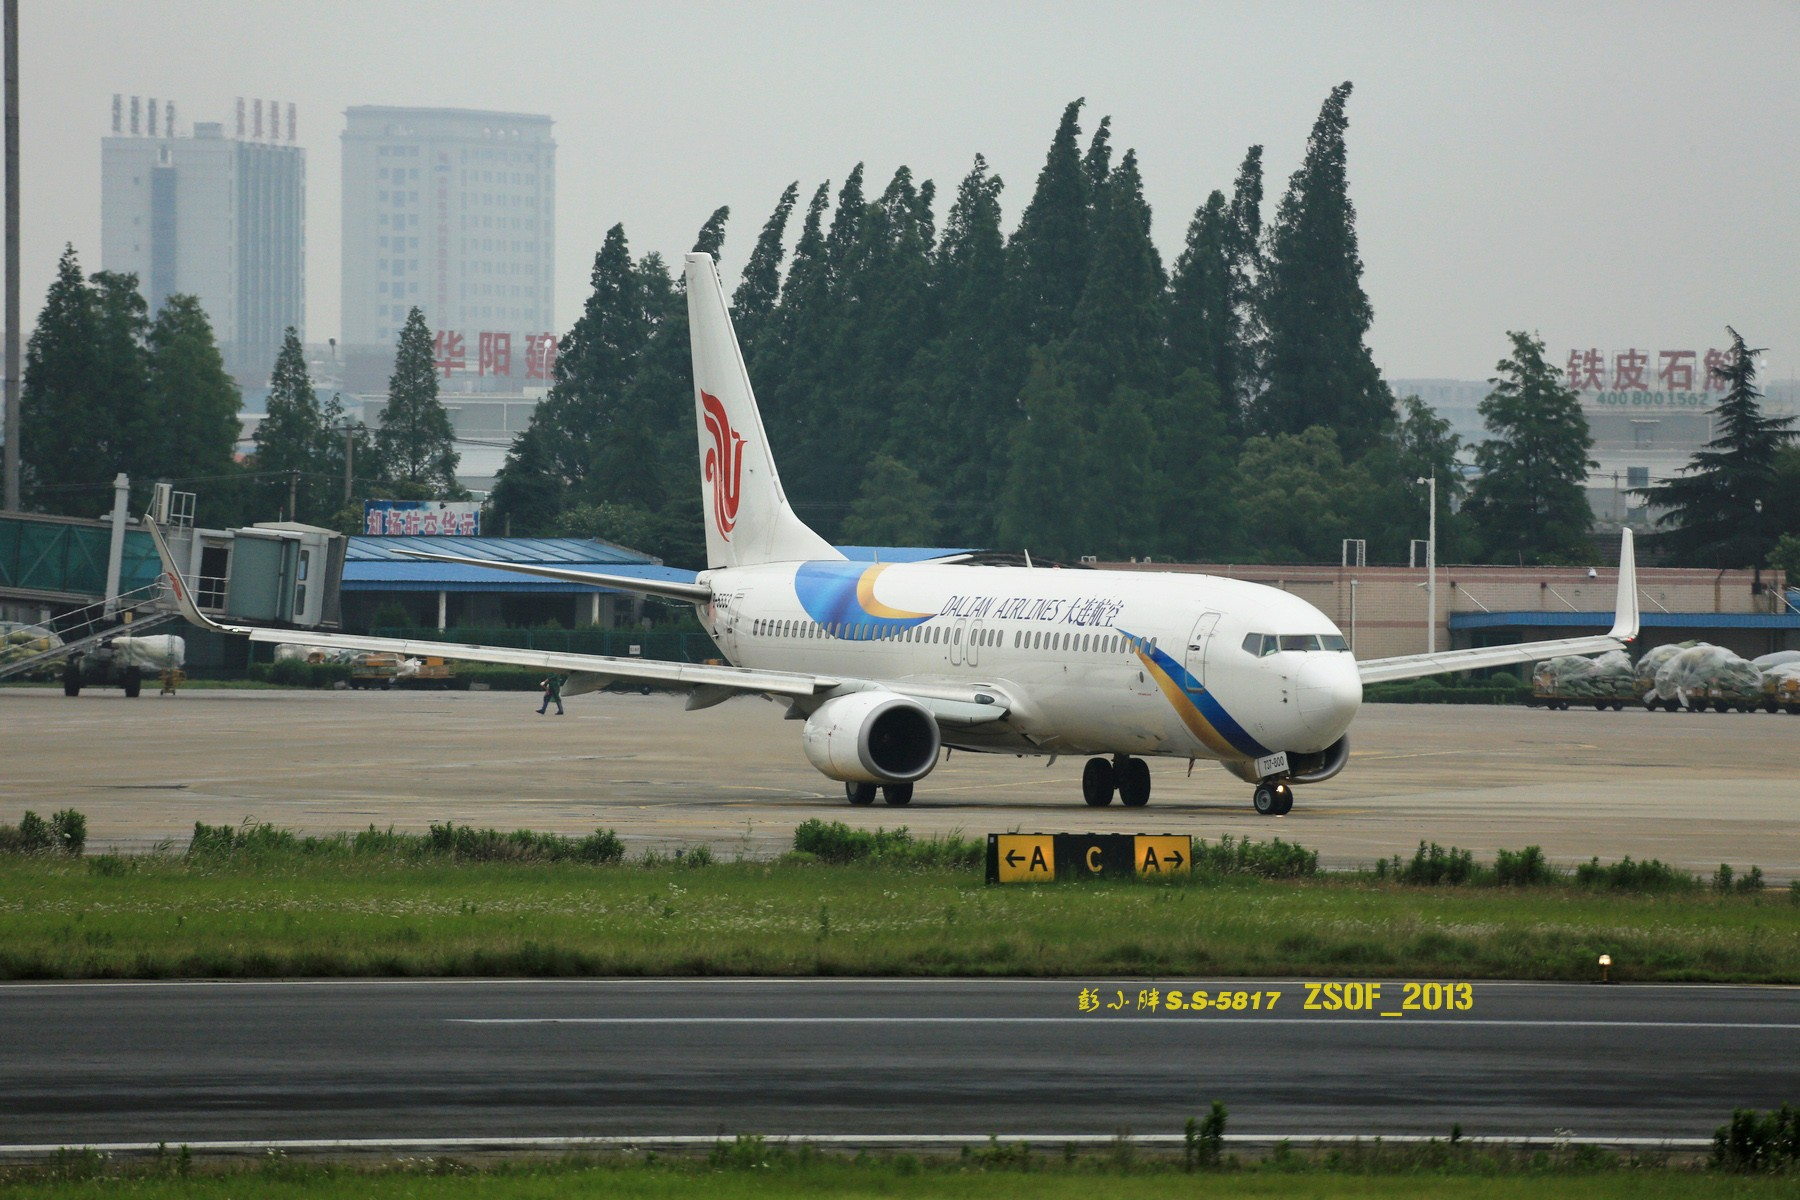 Re:[原创]【骆幕迎新】骆岗LastDay 纪念曾经属于我们的骆岗 BOEING 737-800 B-5553 ZSOF